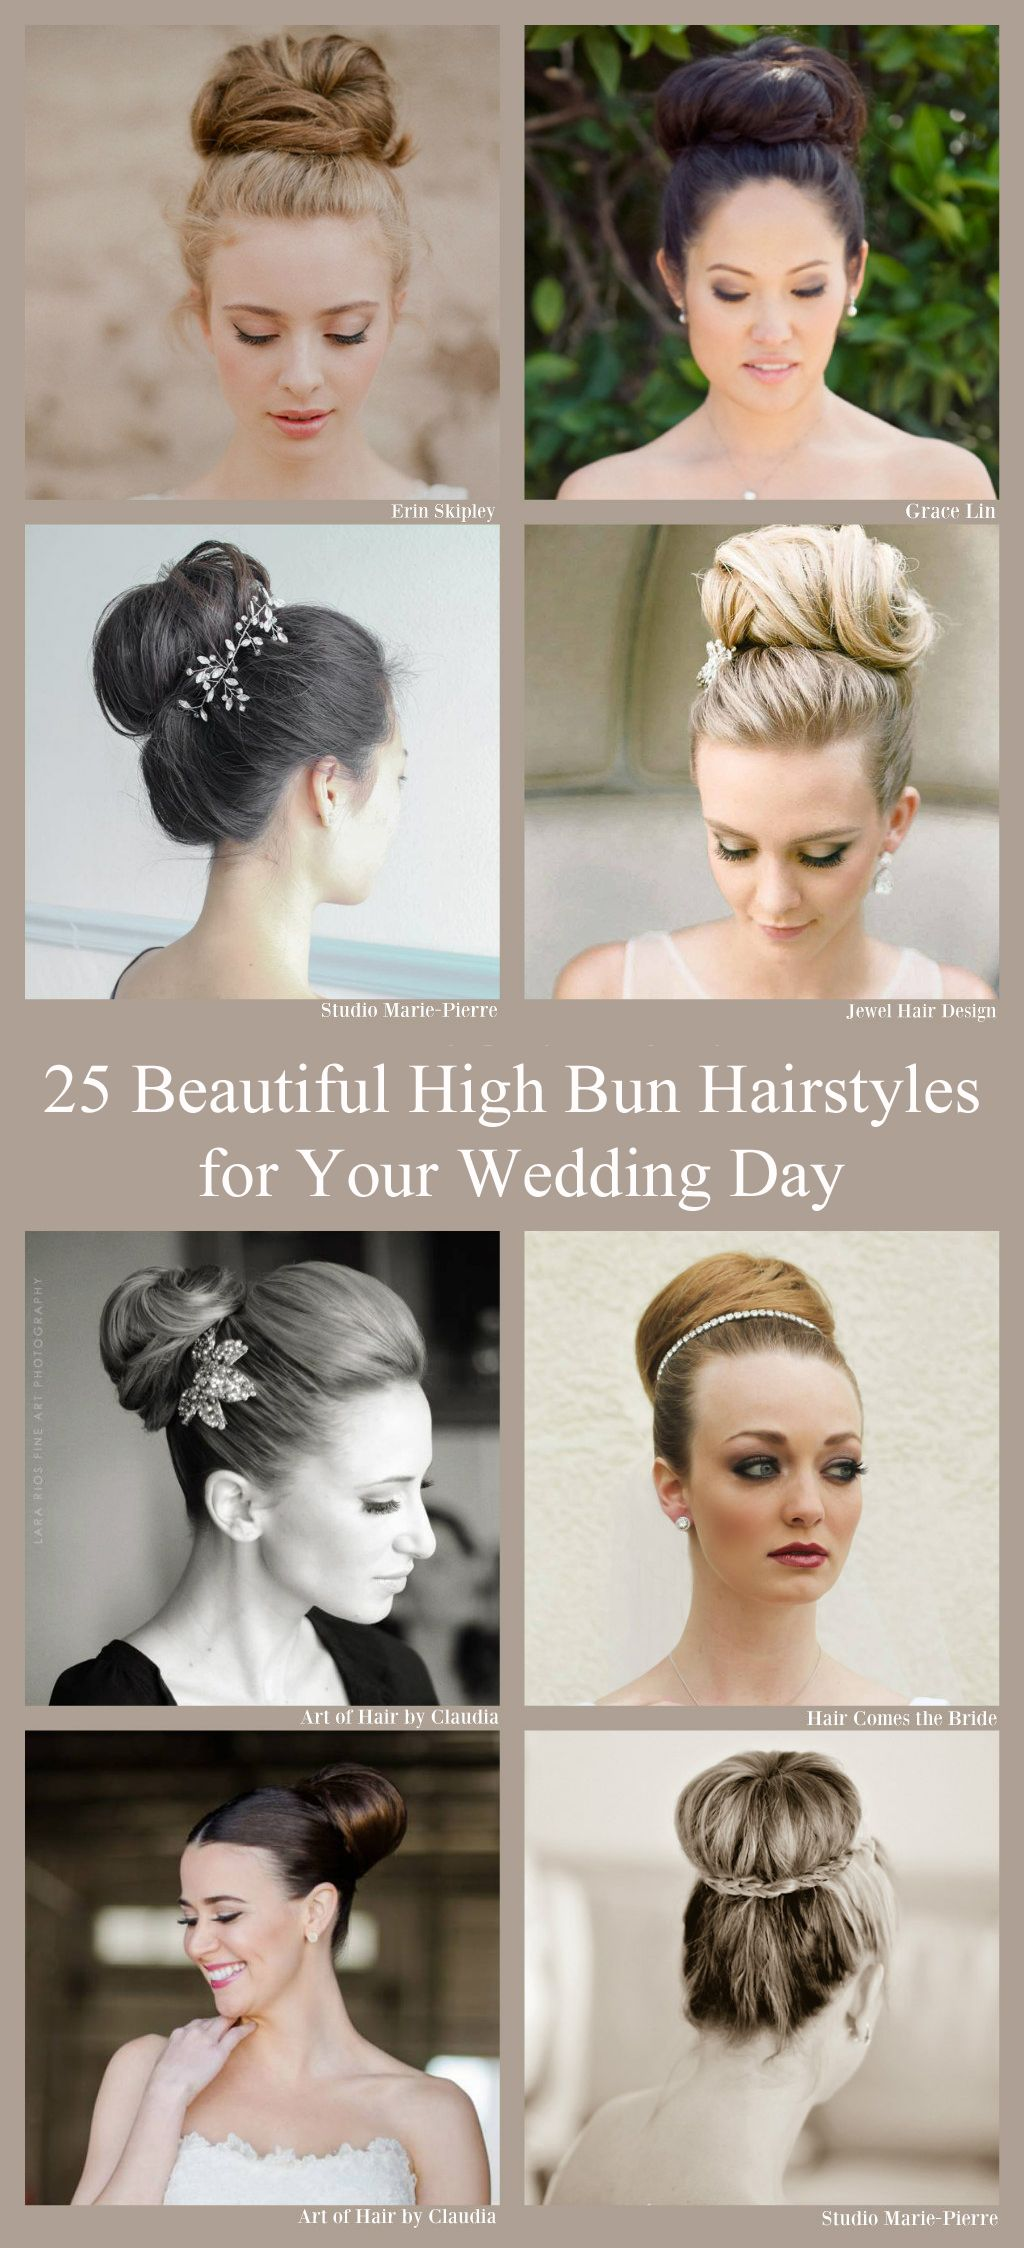 Bridal Bun Hairstyles For The Bride On Her Wedding Day Bride Bridesmaids Bride Hairstyles Bridal Hair Buns Bun Hairstyles